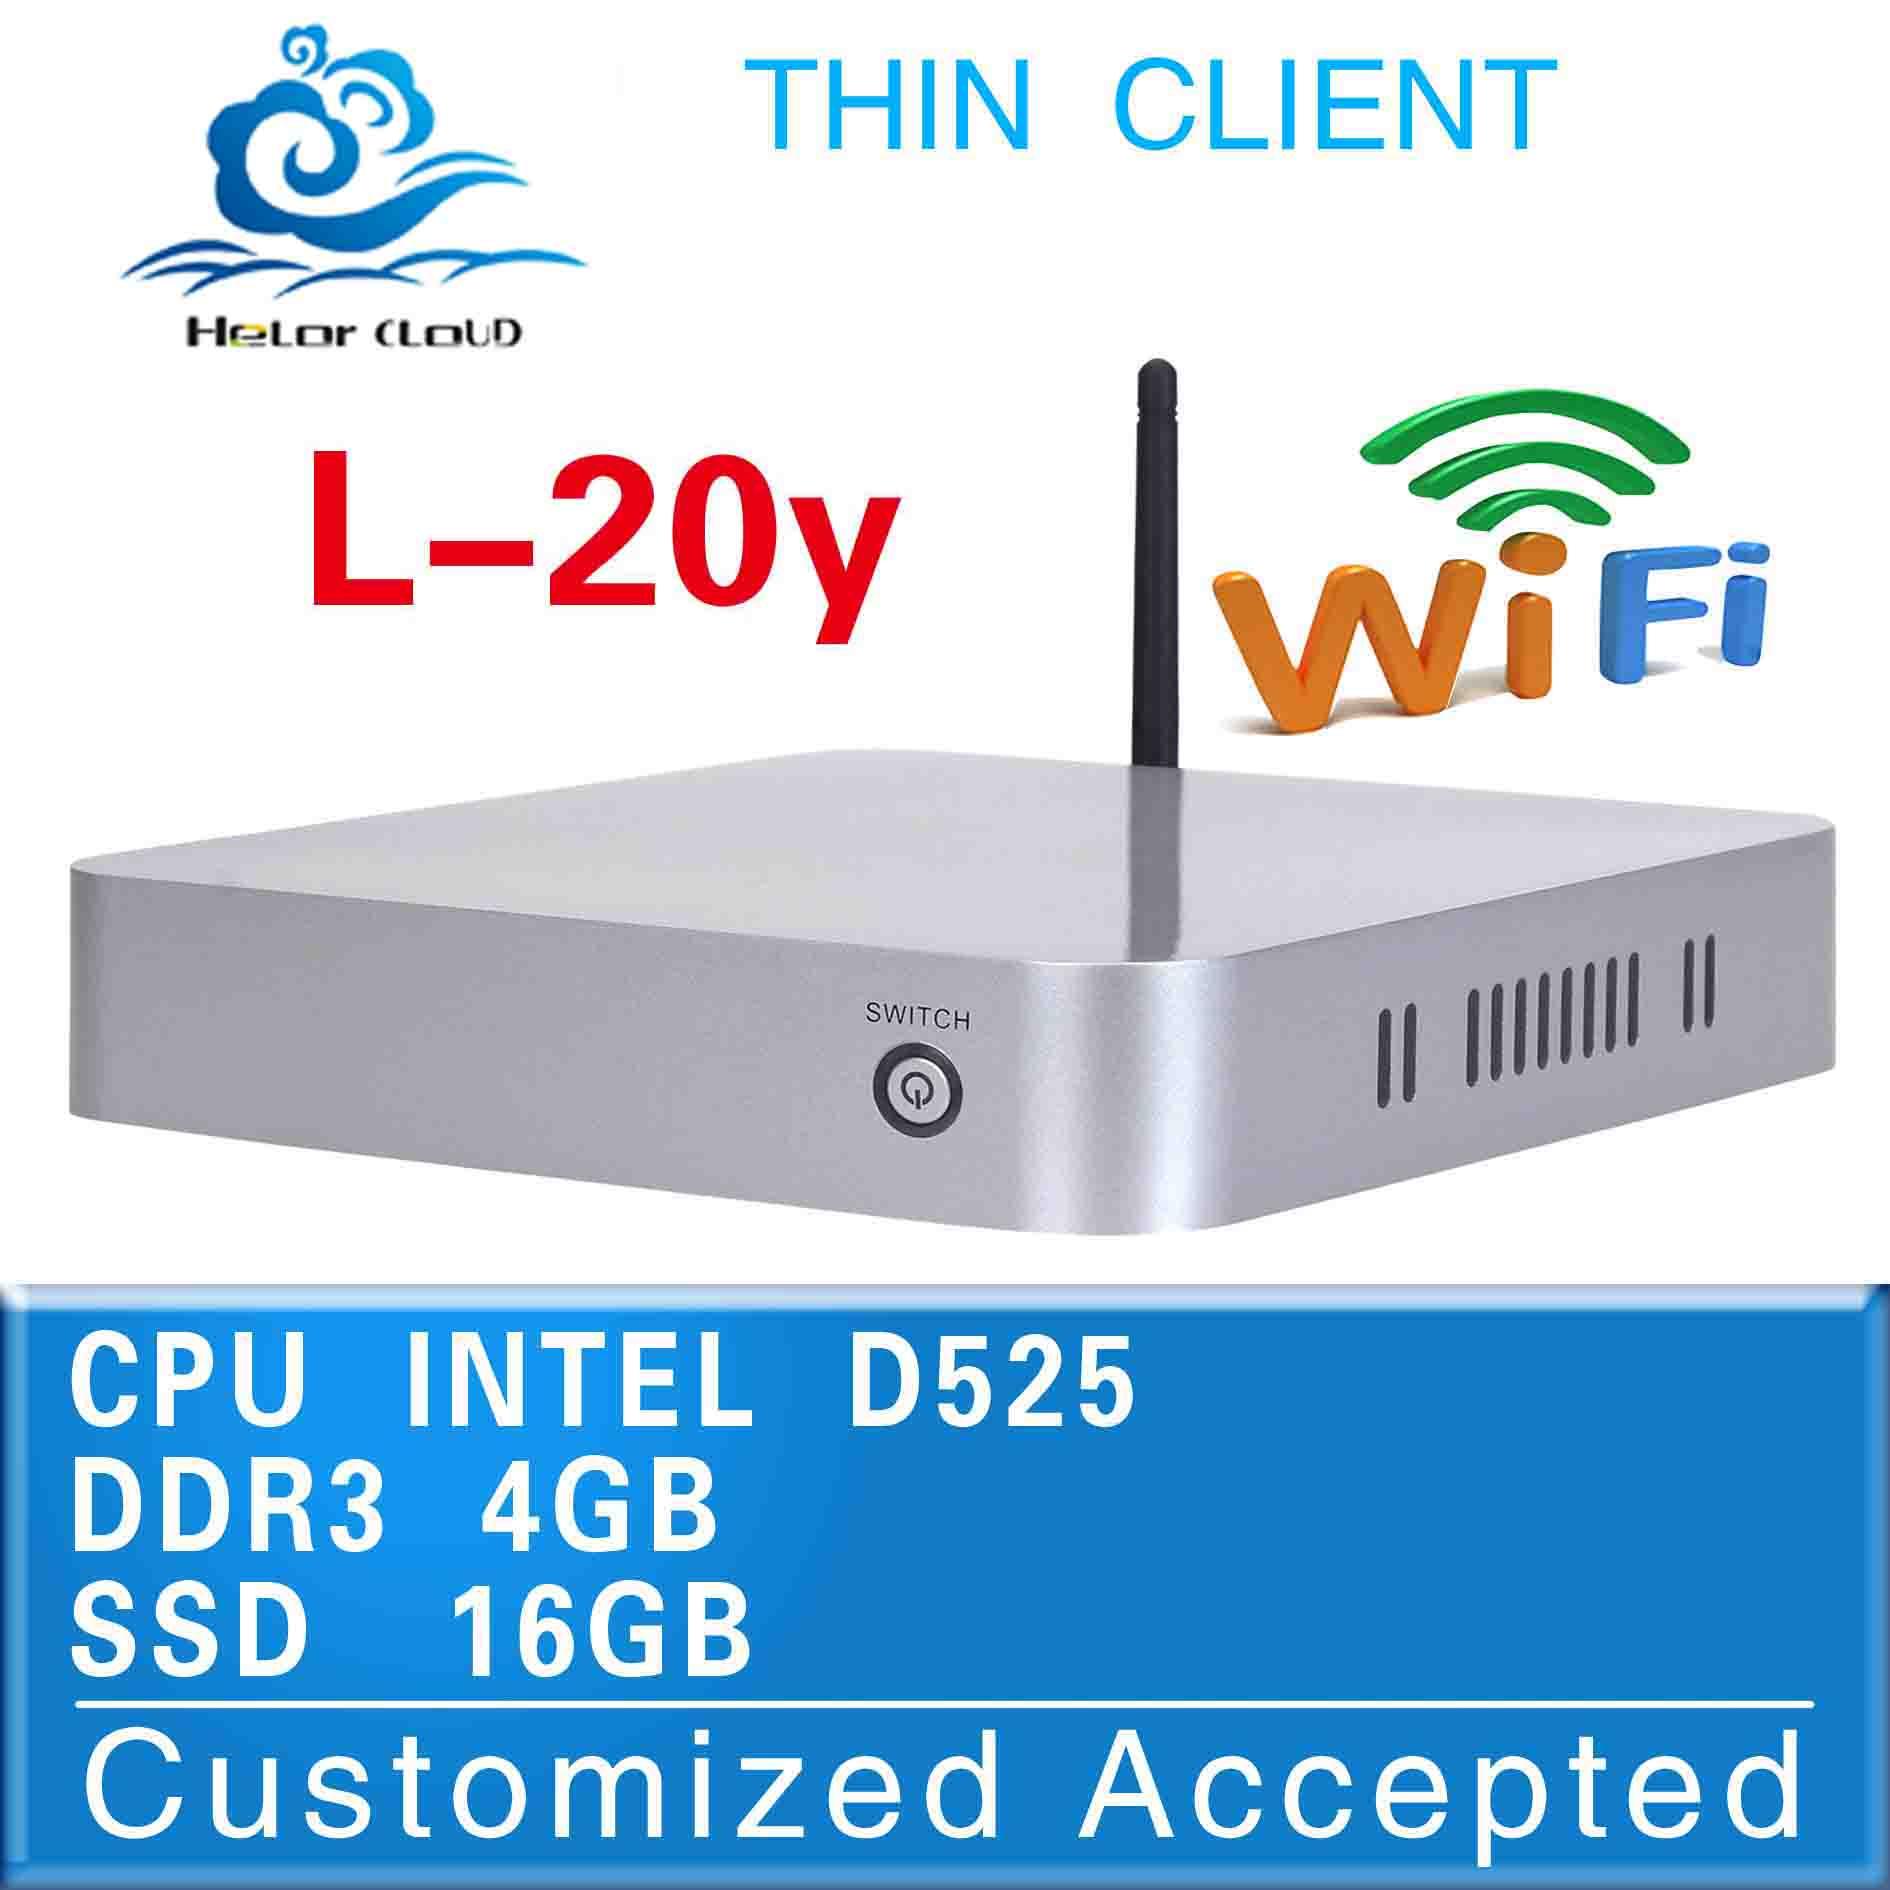 the best quality no noise mini computer l-20y mini business pc 4g ram 16g ssd Atom D525 network fan desktop thin client(China (Mainland))